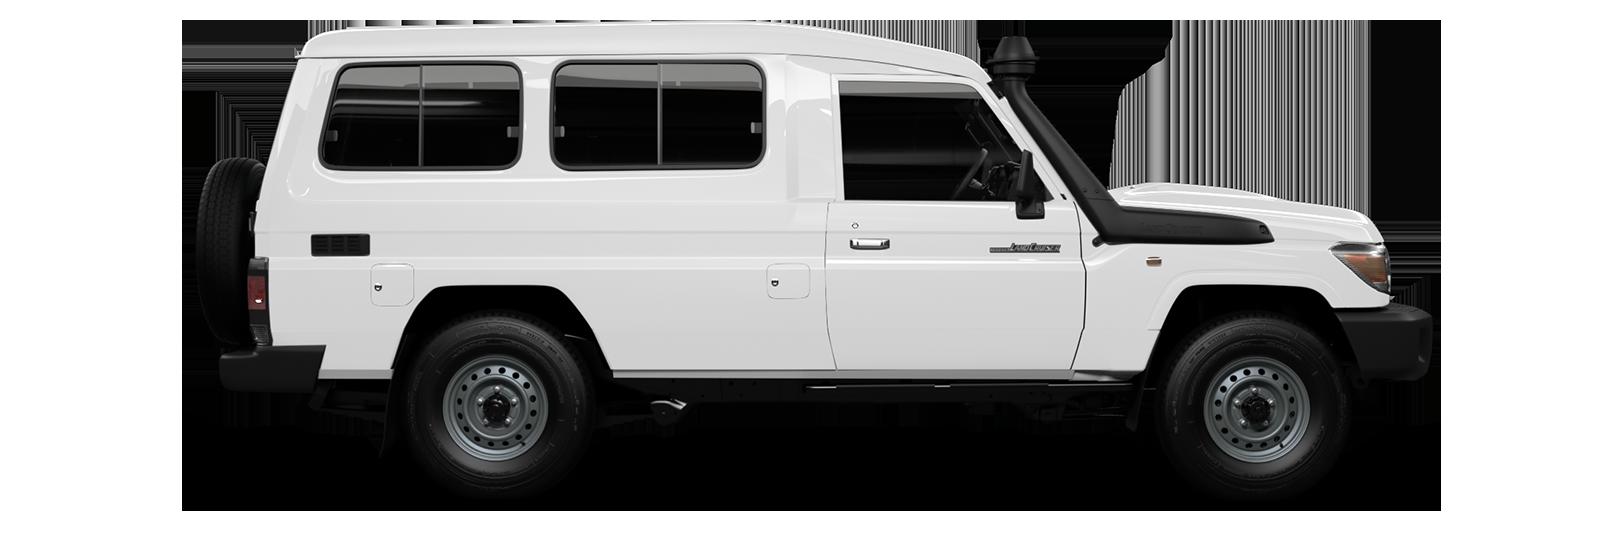 Toyota Land Cruiser 70 >> Toyota Land Cruiser 70 Toyota Nz